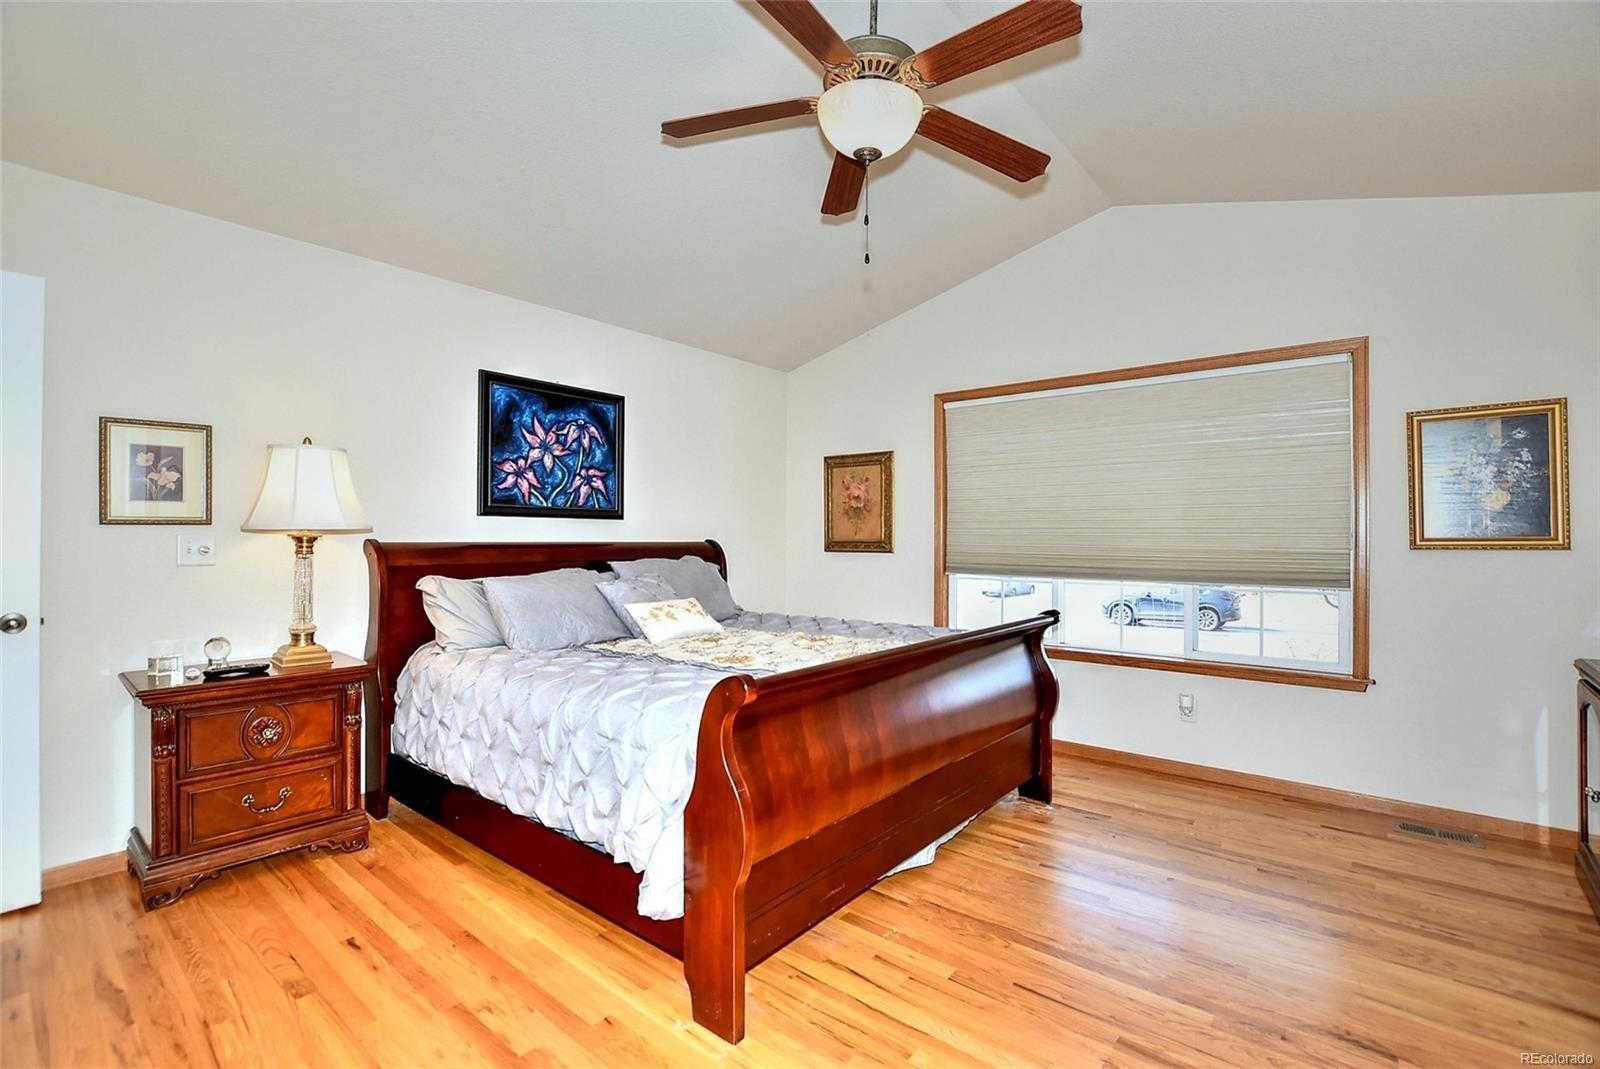 MLS# 8716122 - 18 - 2930 Culebra Peak Drive, Loveland, CO 80538